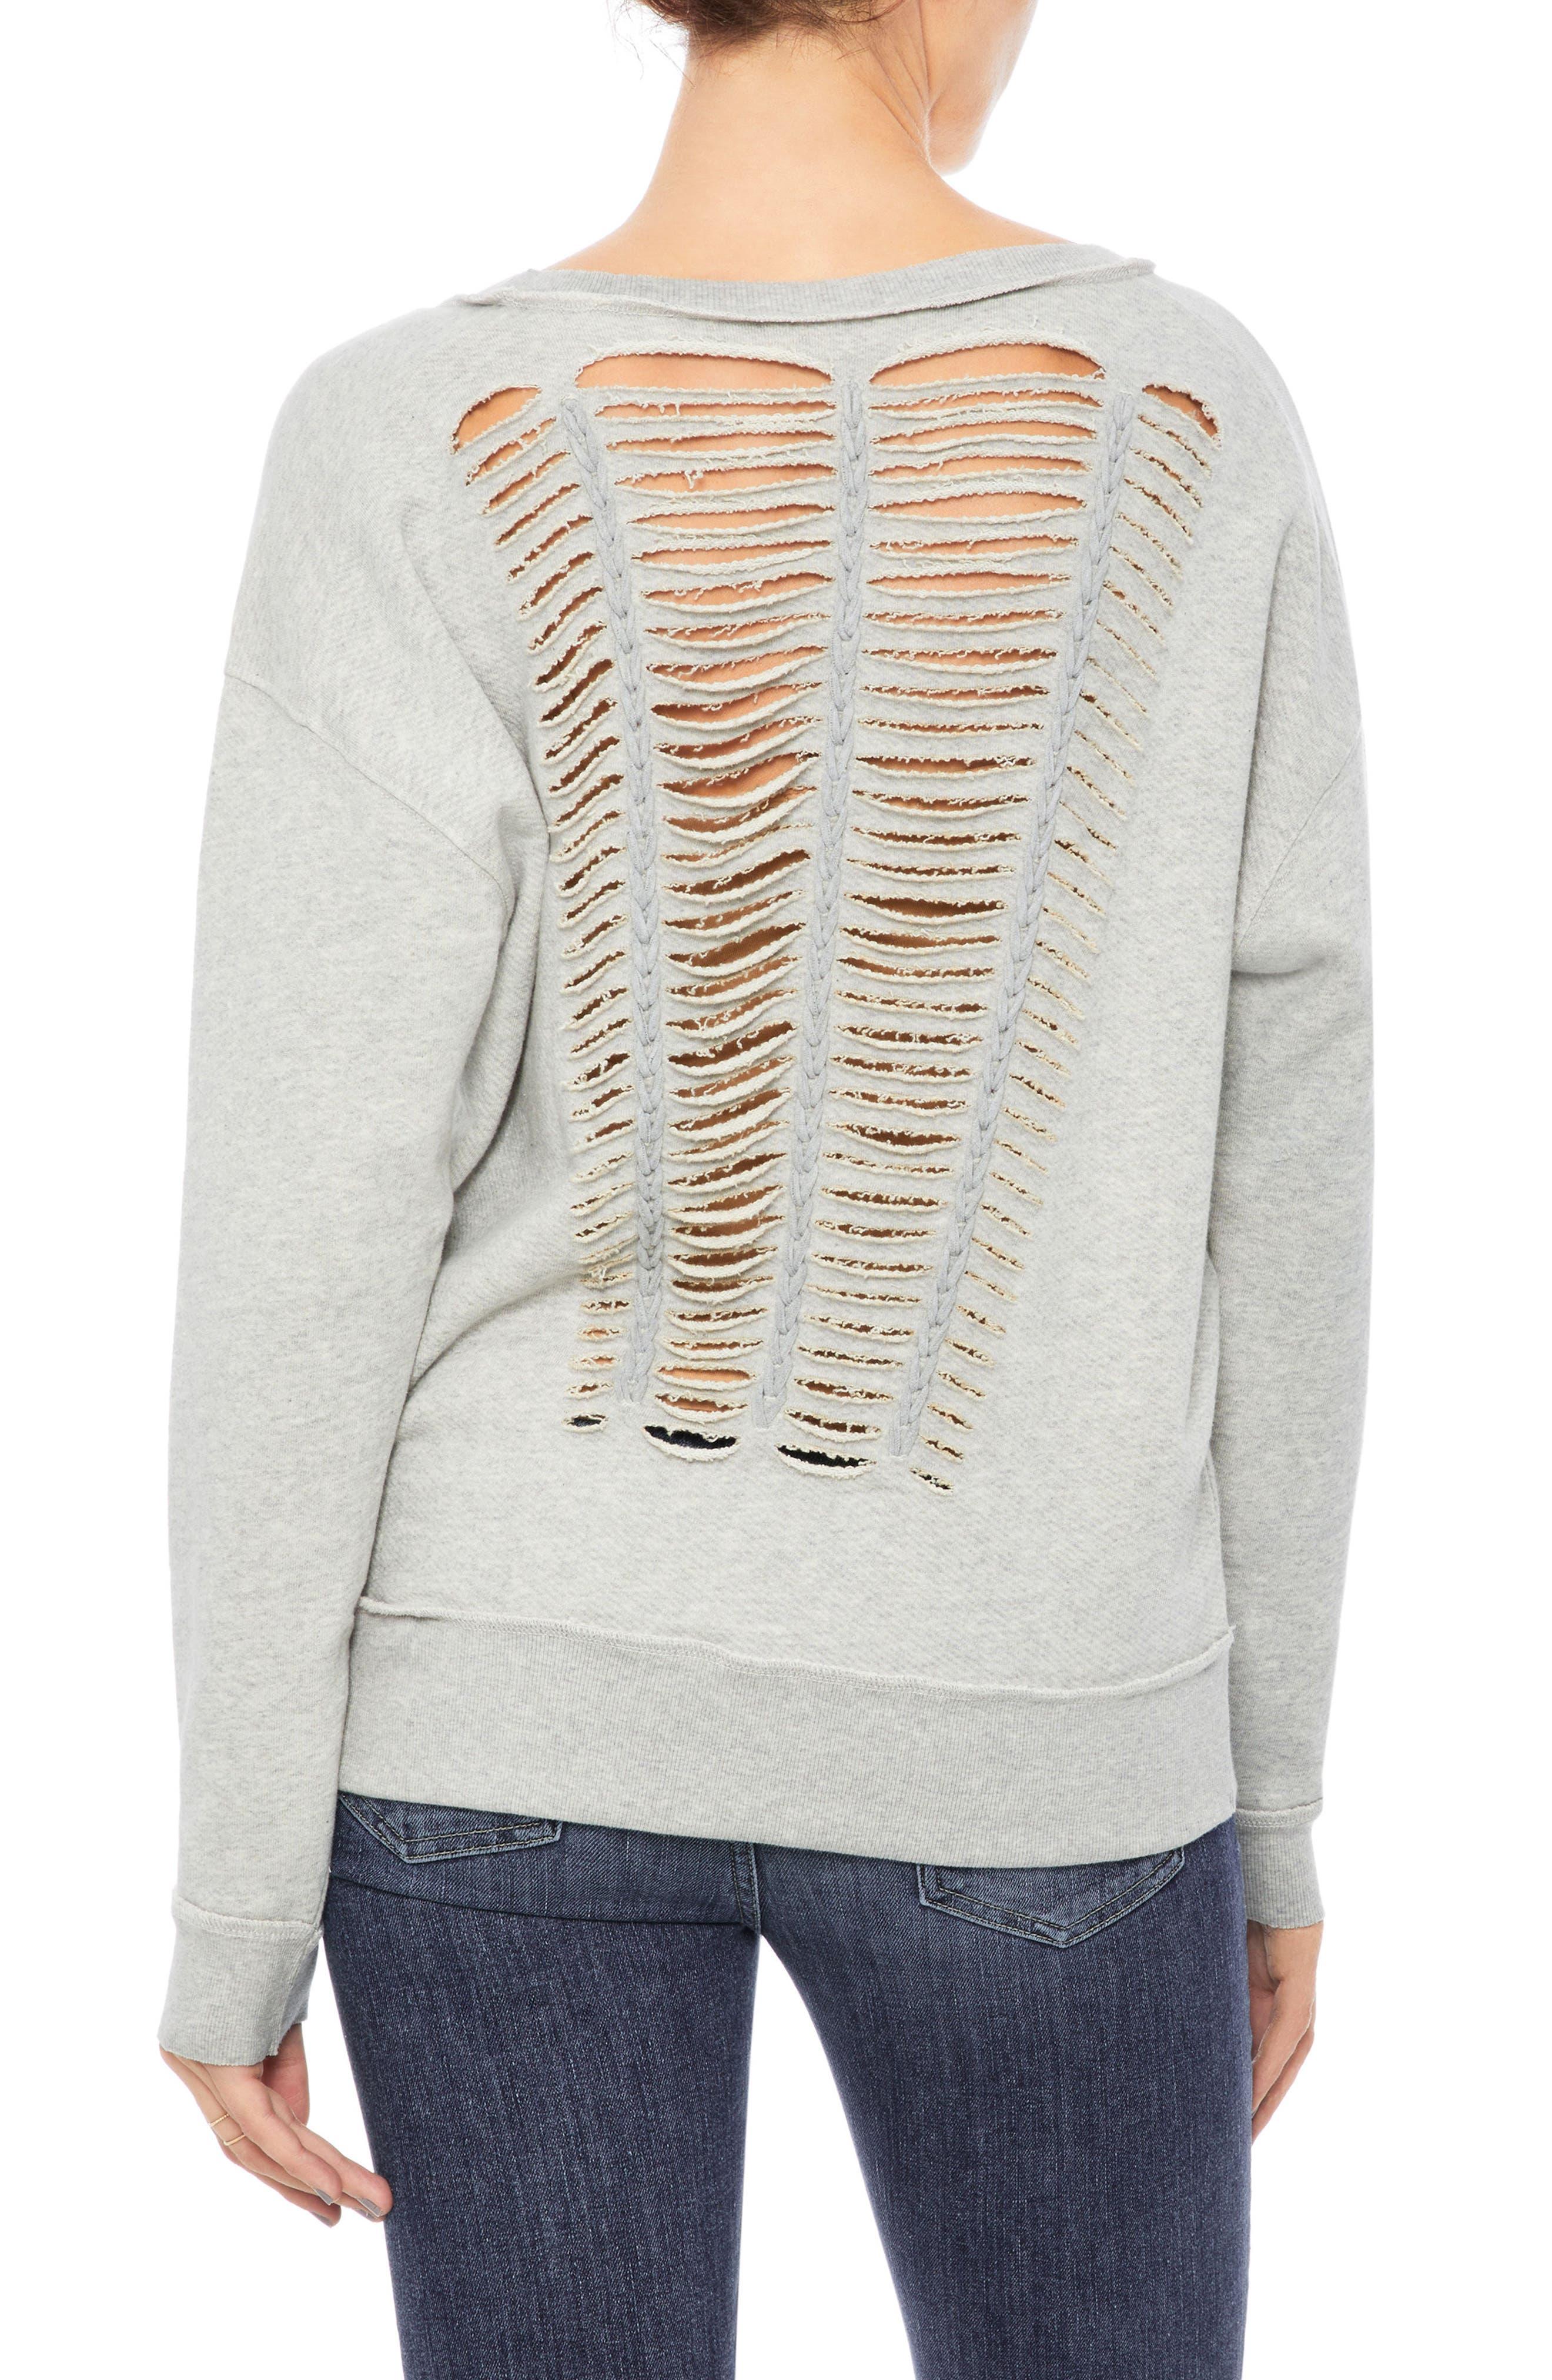 Piya Sweatshirt,                         Main,                         color, 030